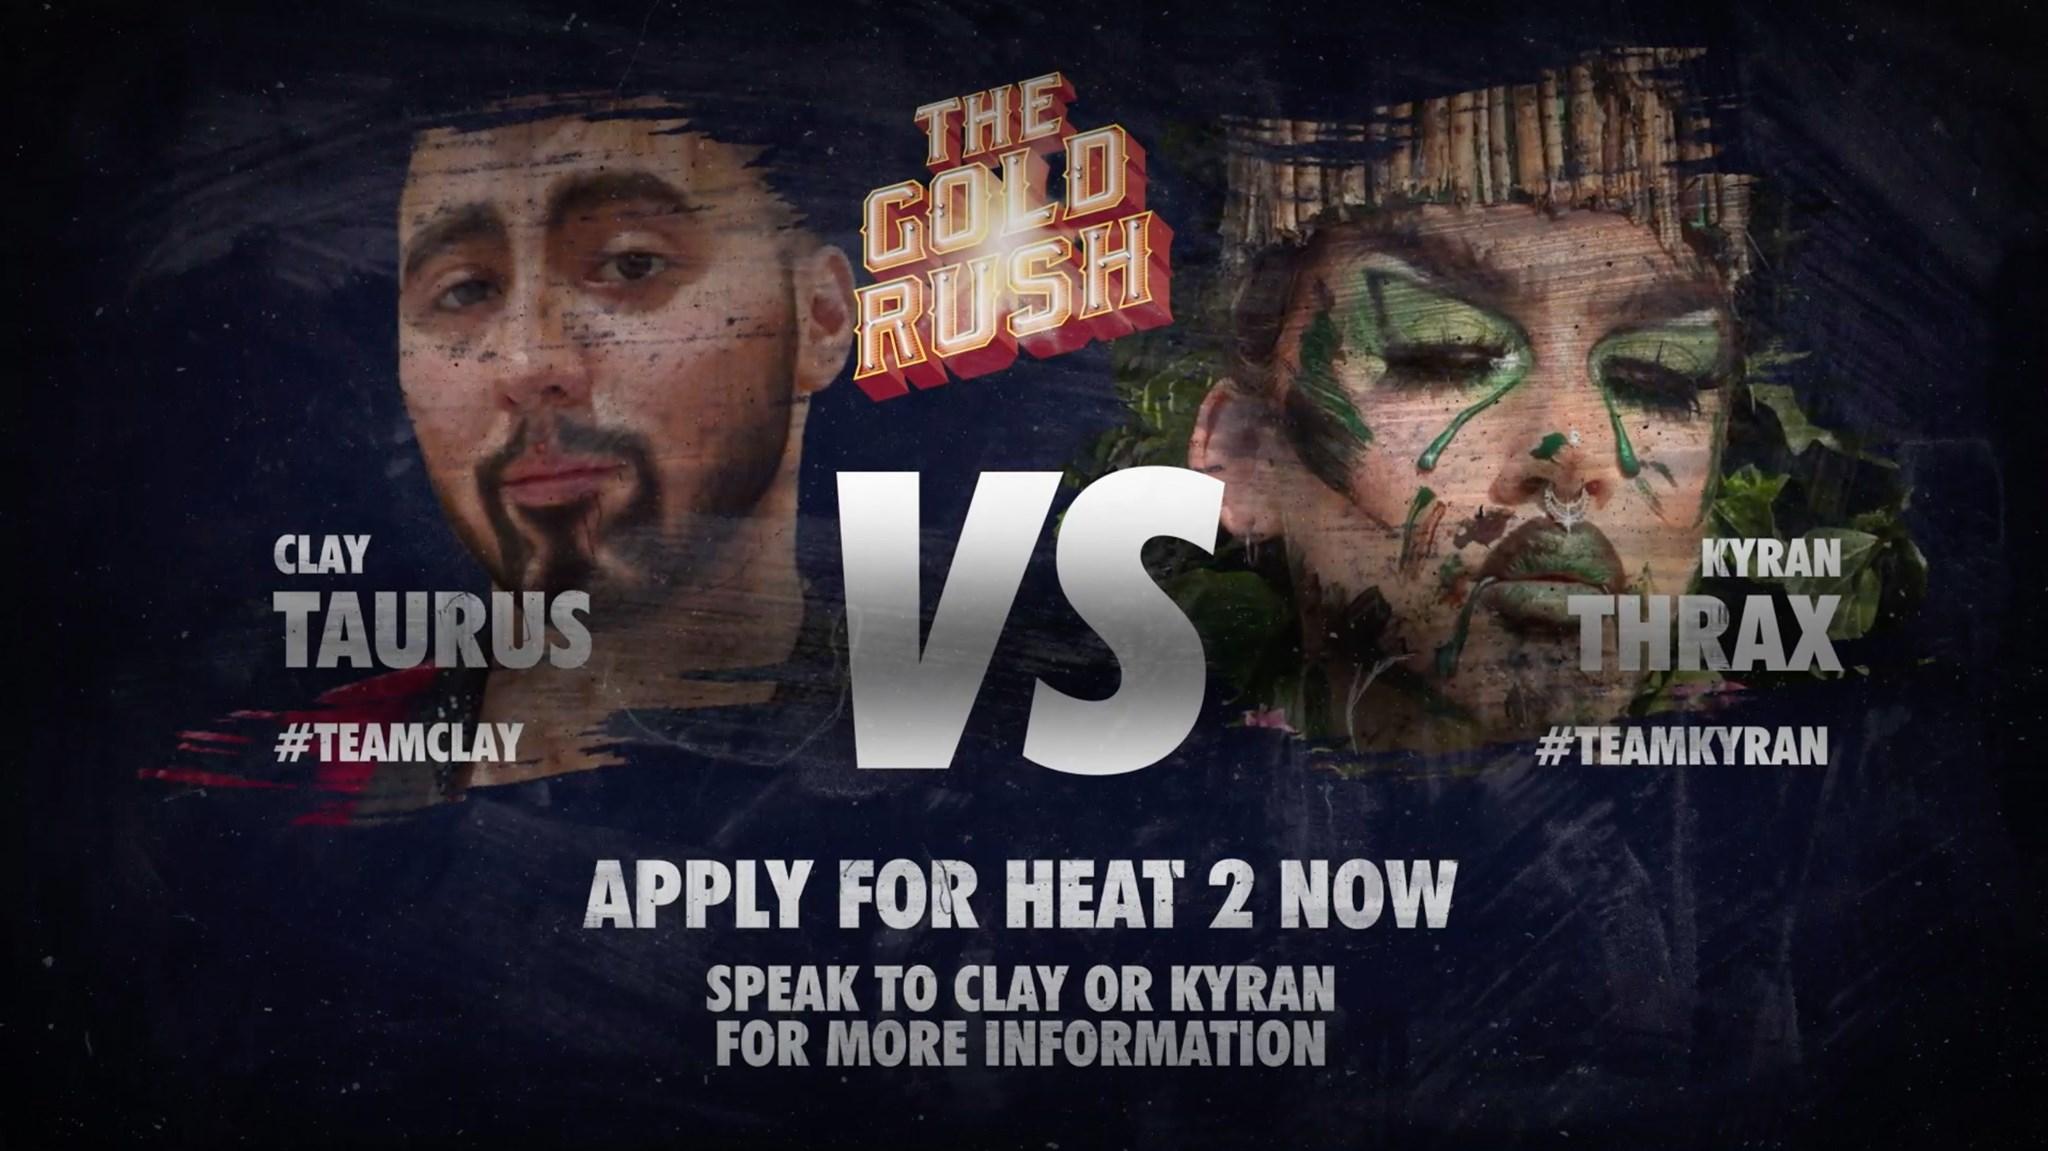 The Gold Rush: Season – 4 Heat 2